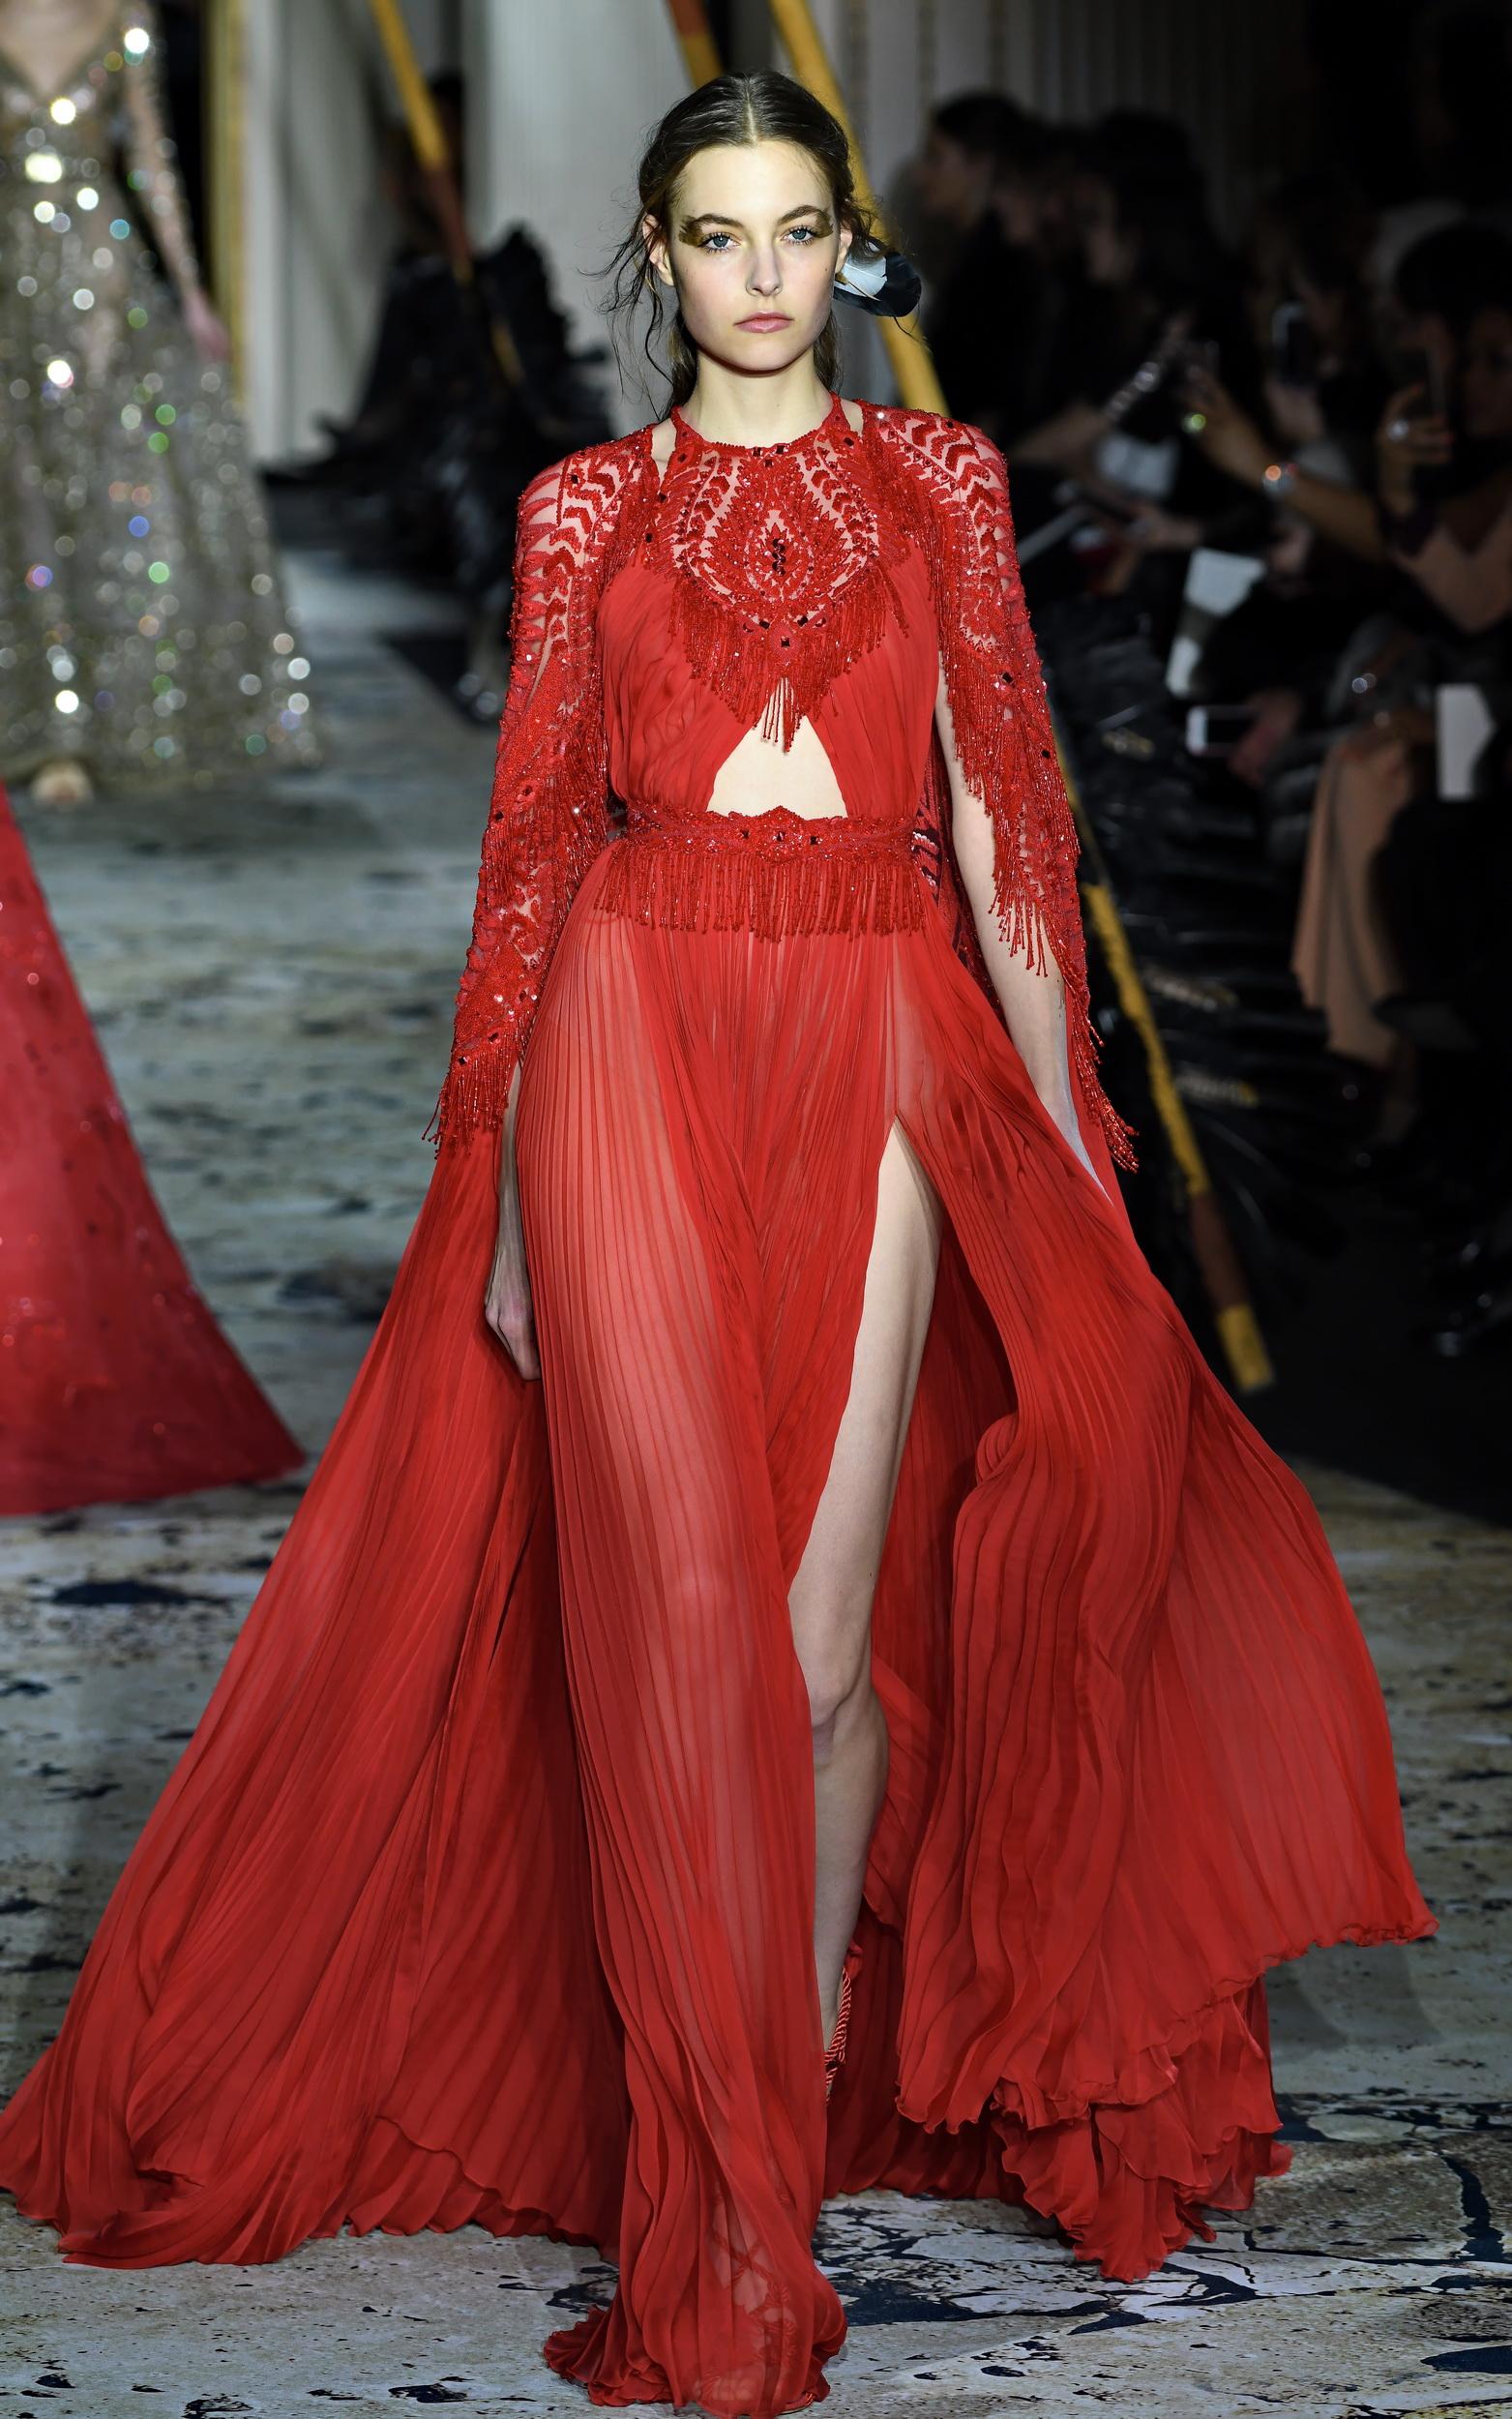 Paris Haute Couture SS 2018 Zuhair Murad 4to4u Arthur Koff 14.JPG